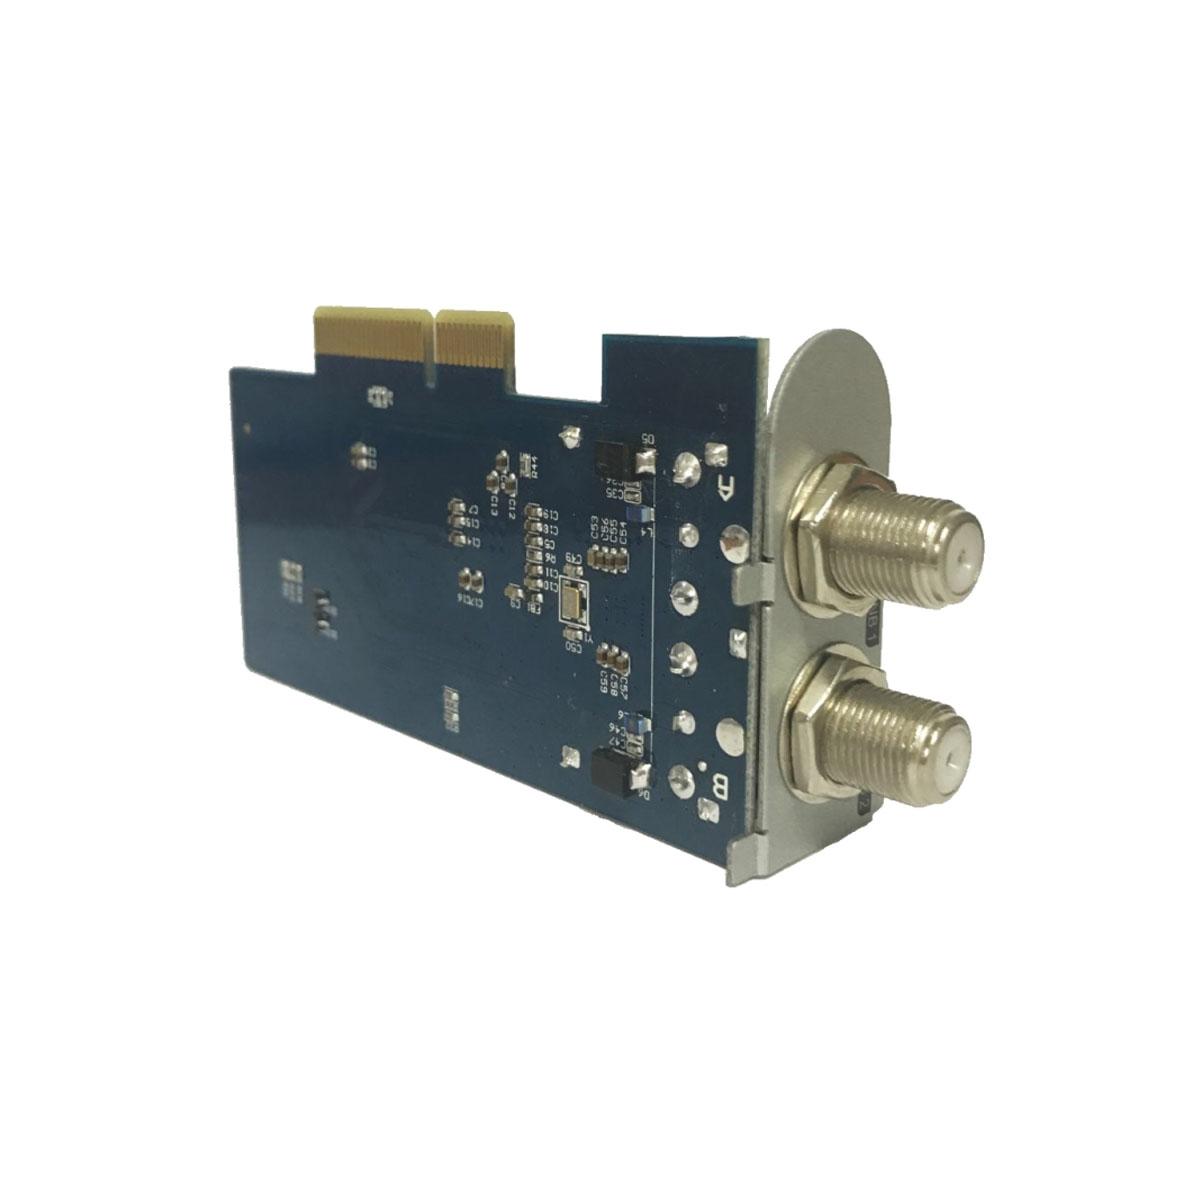 Dreambox DVB-S2X Multistream Dual Tuner passend für DM7080 DM820 DM900 HD TV 4K Full HD